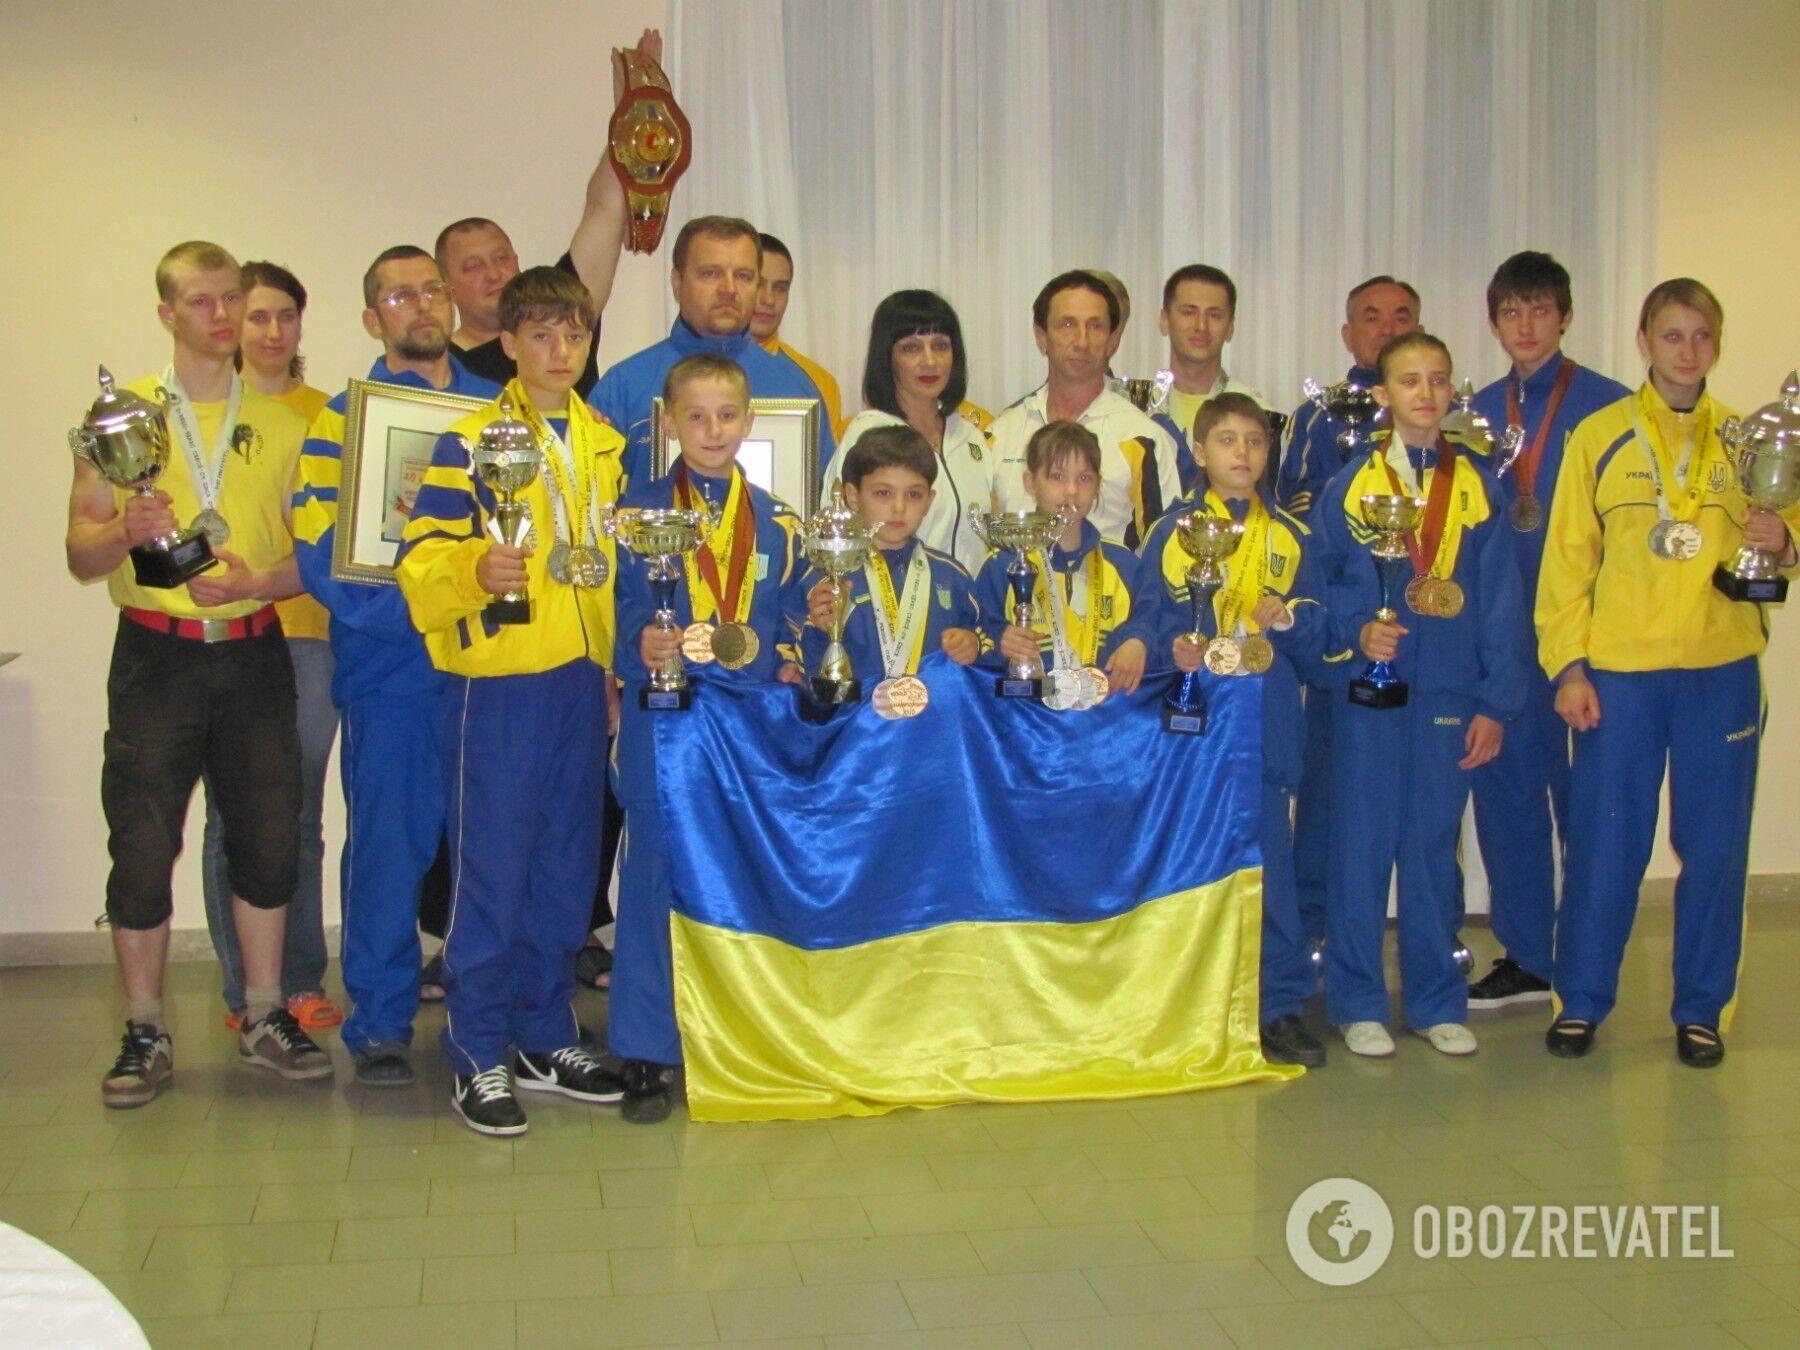 Олег Шевандин – президент Федерации ушу/гунфу и цигун Донецкой области